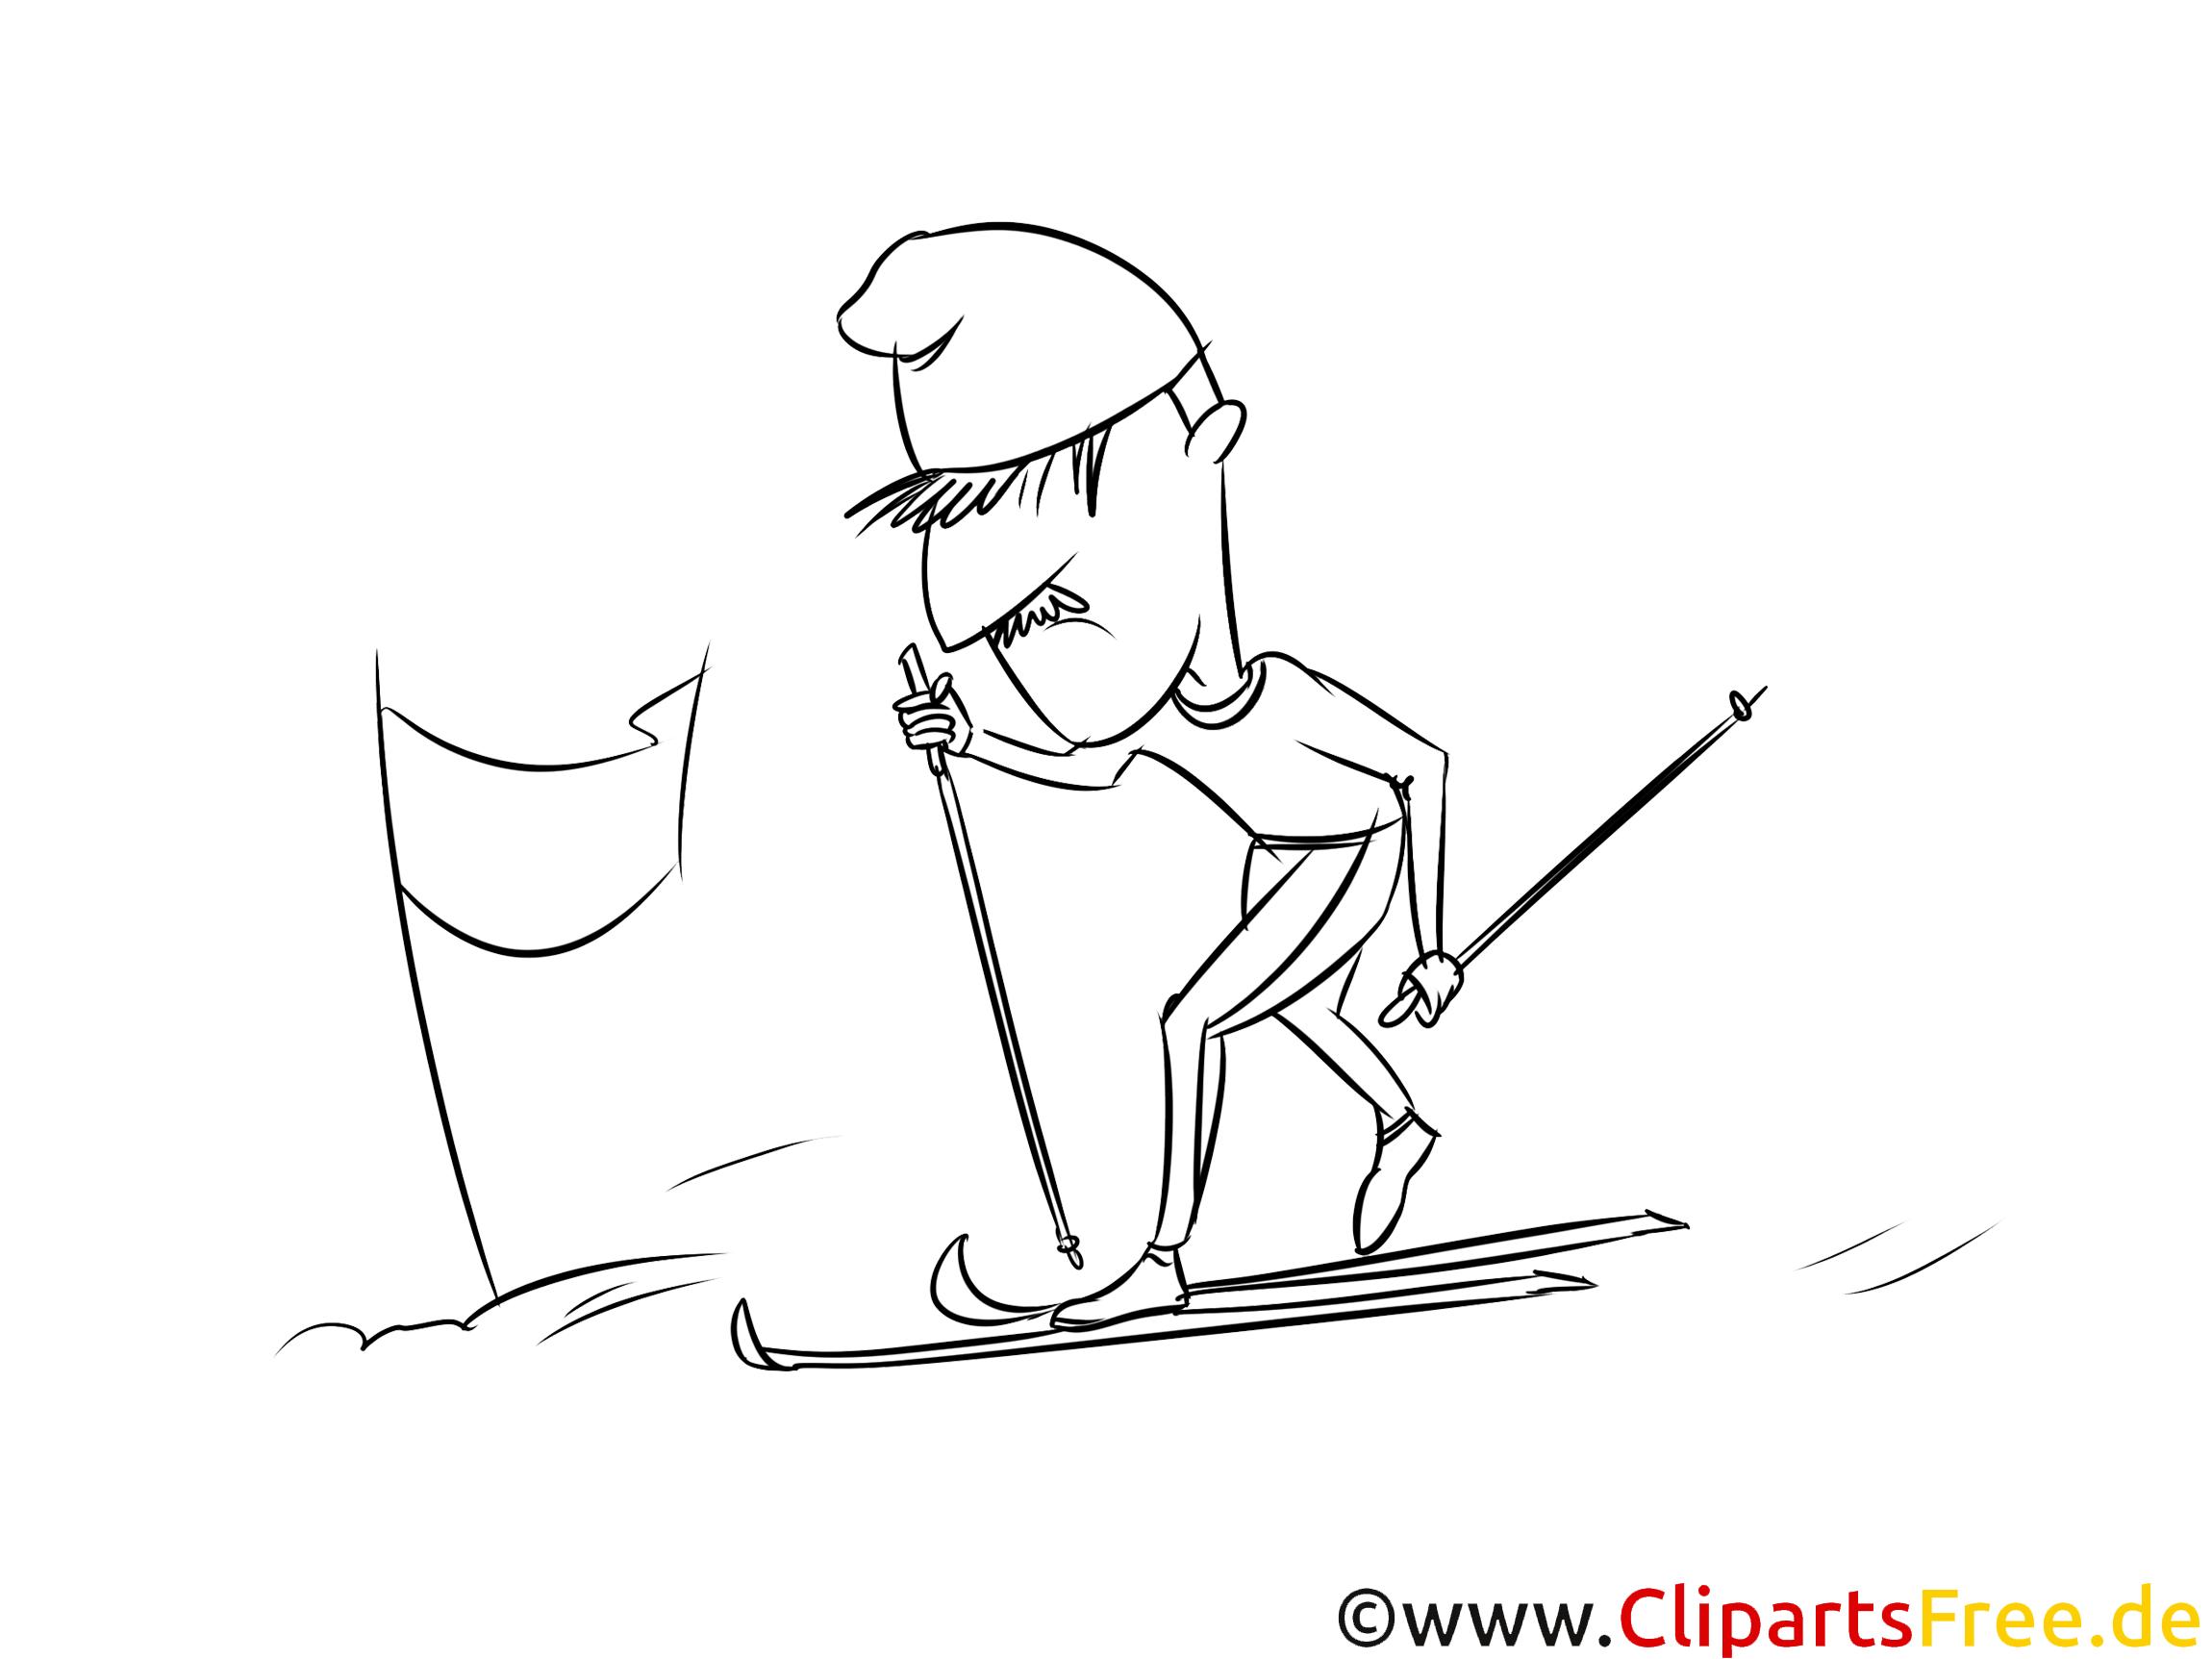 ski urlaub winter sport ausmalbild kostenlos